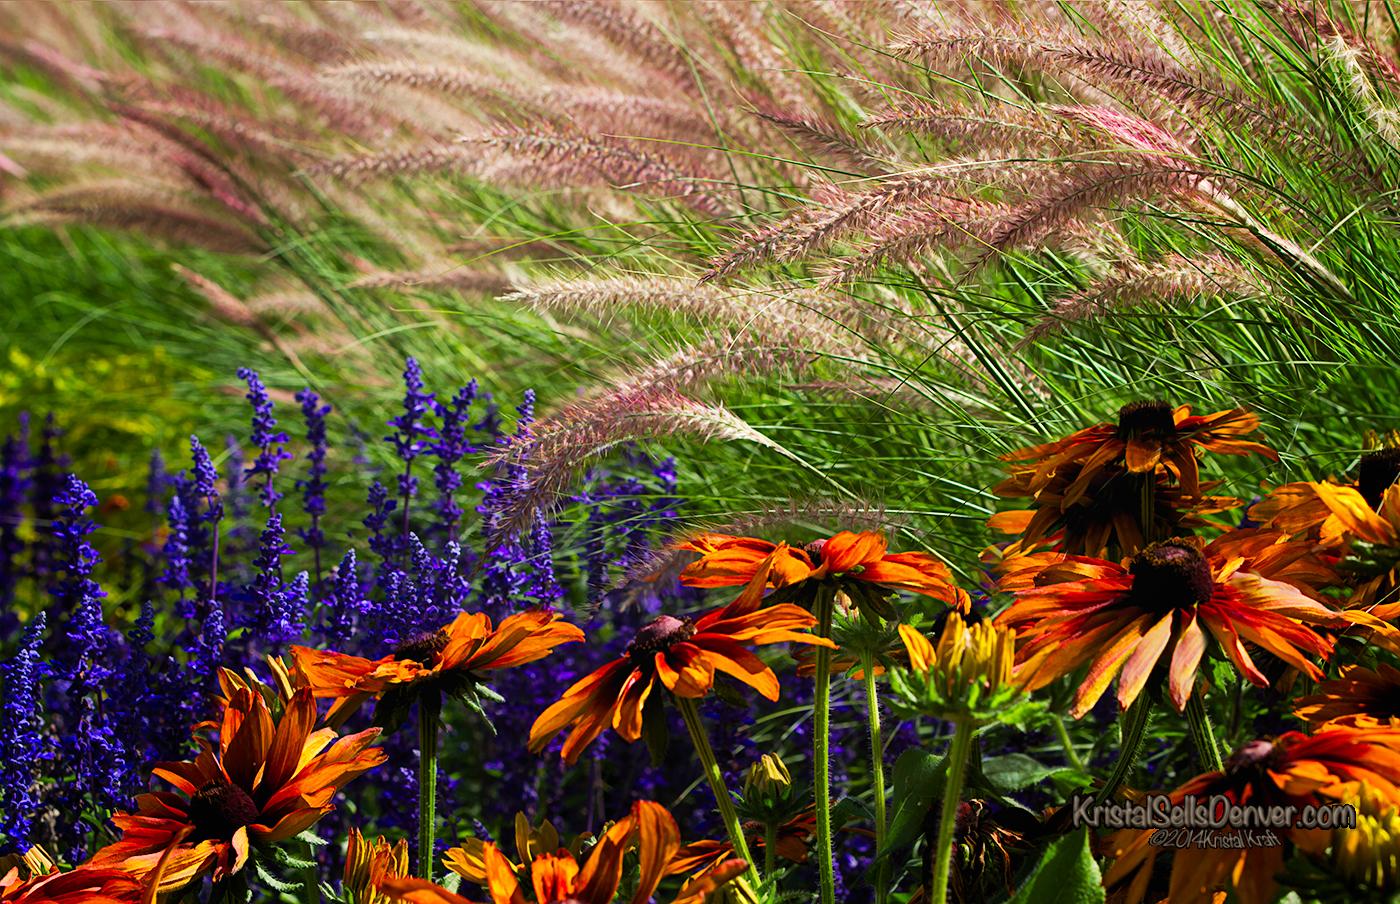 Flowers growing in a summer garden in Denver, Colorado